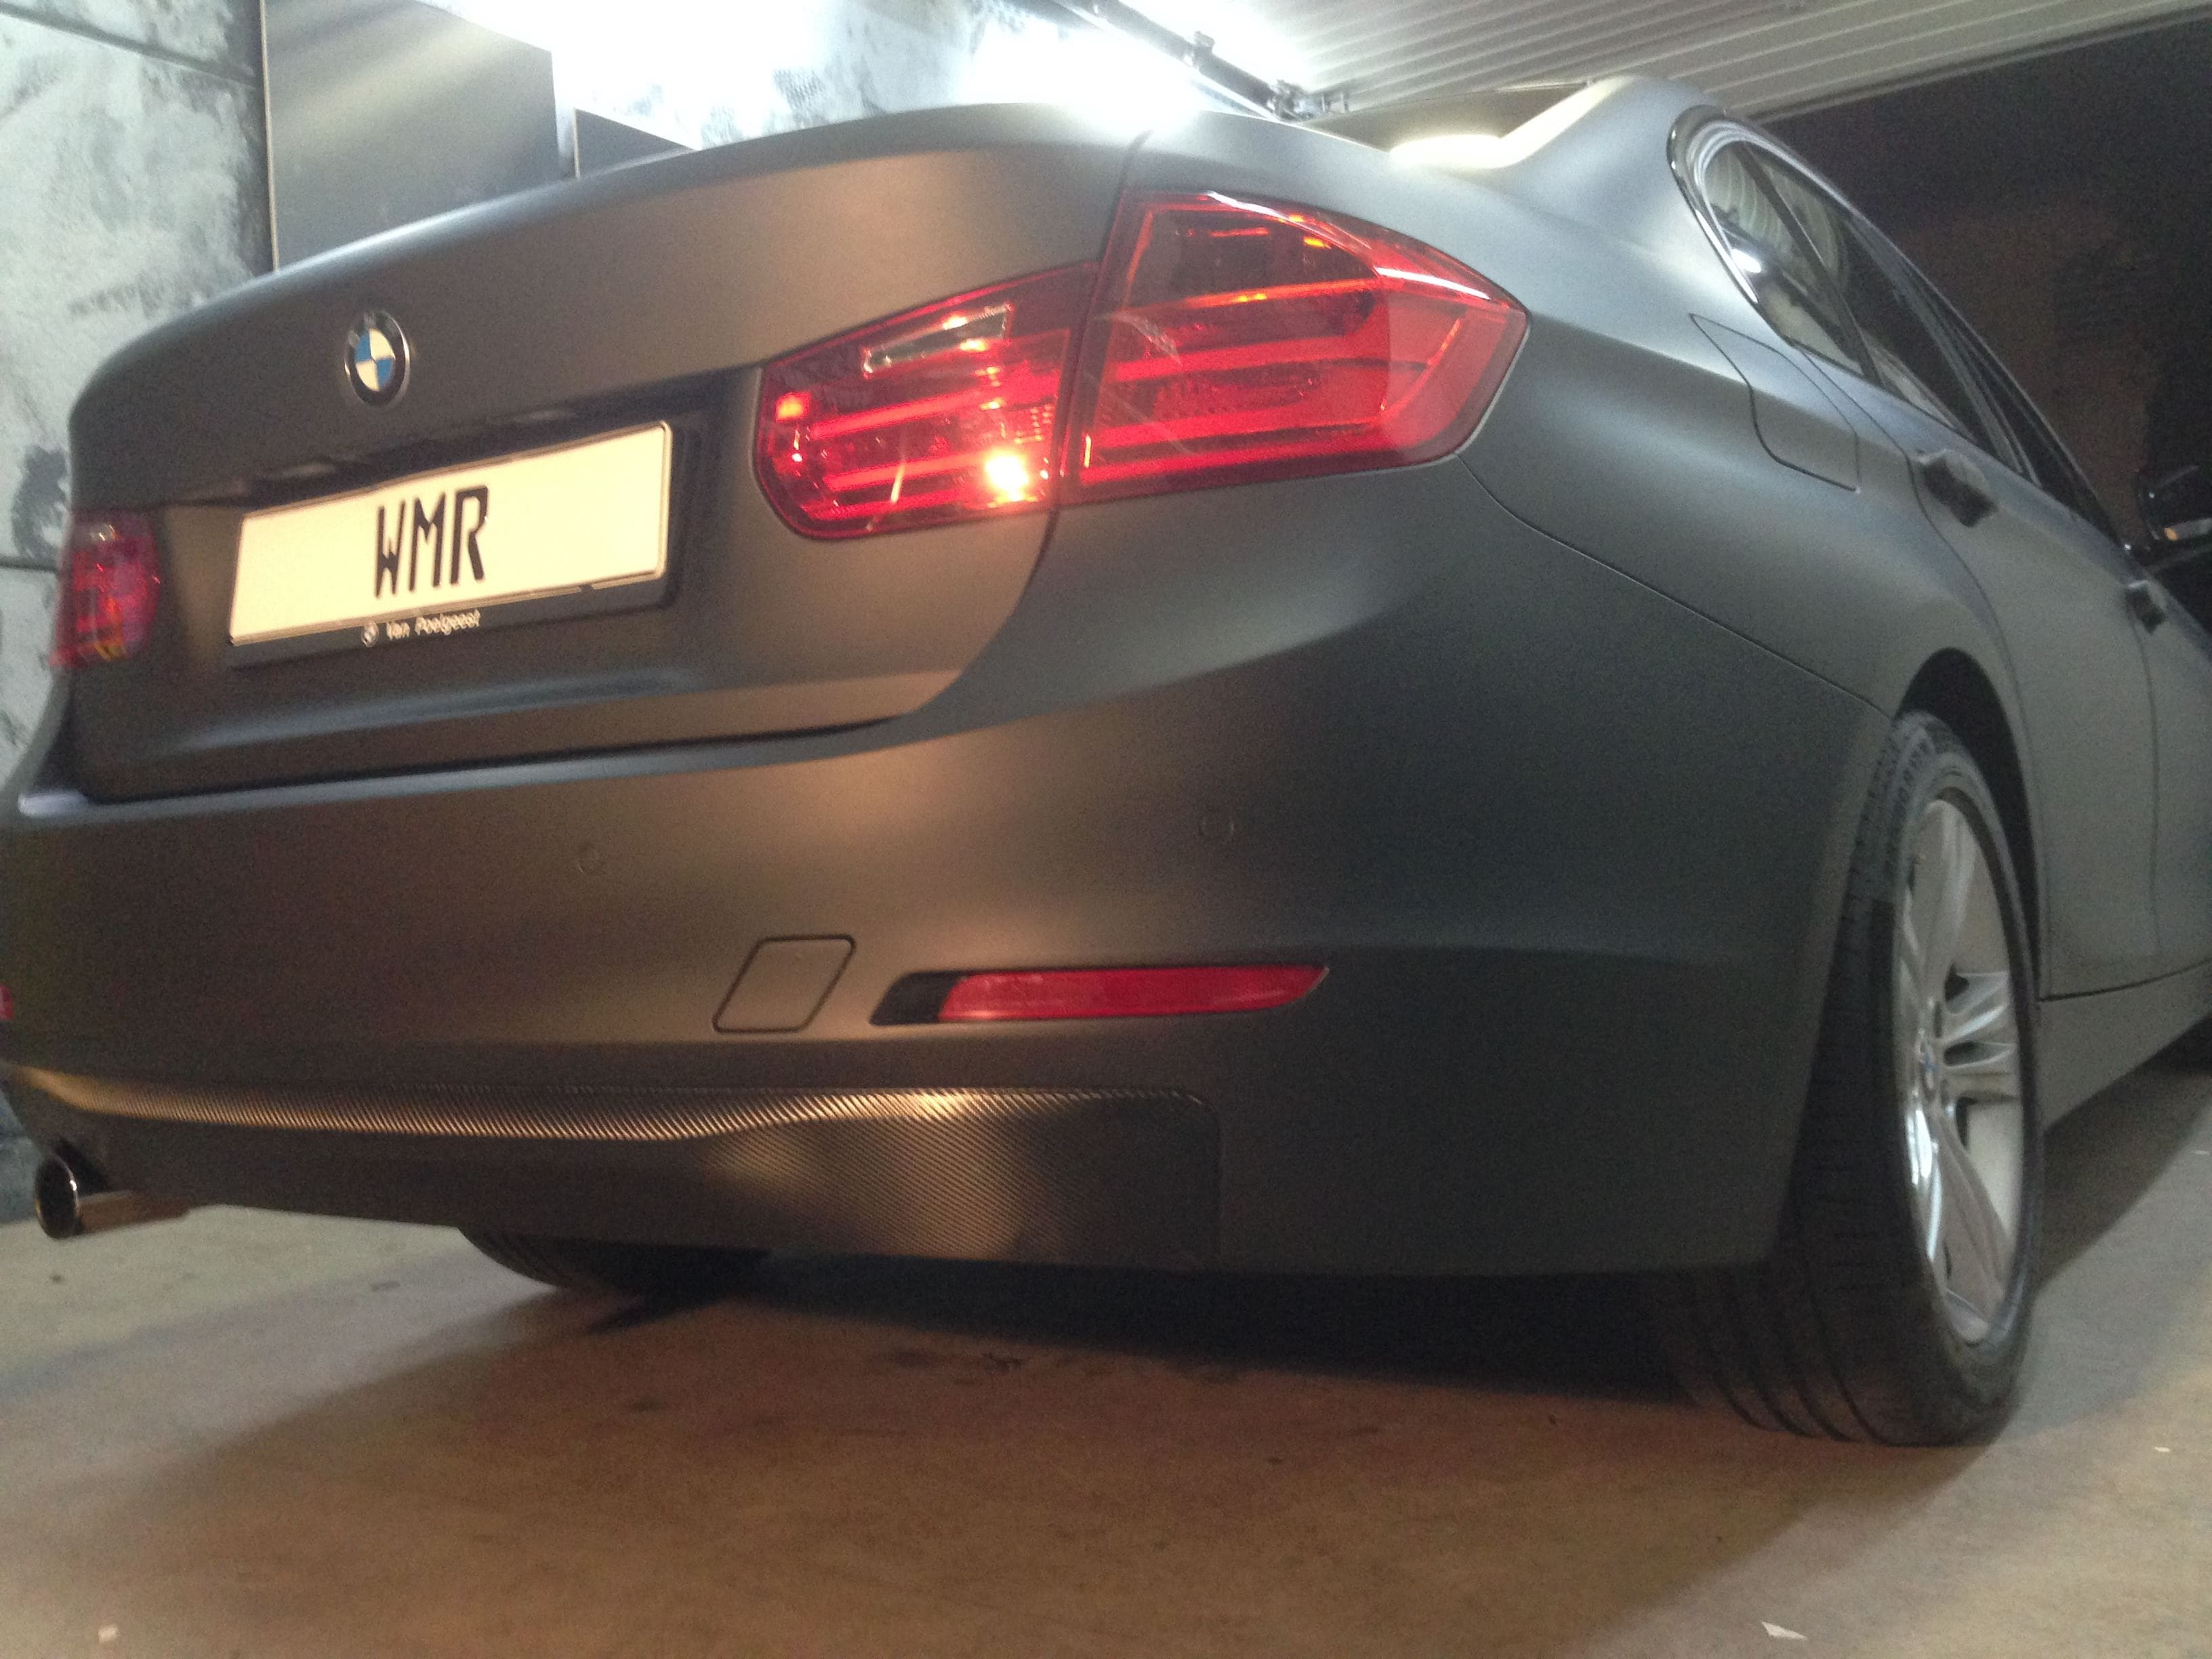 BMW E92 3 Serie met Mat Zwarte Wrap, Carwrapping door Wrapmyride.nu Foto-nr:5418, ©2020